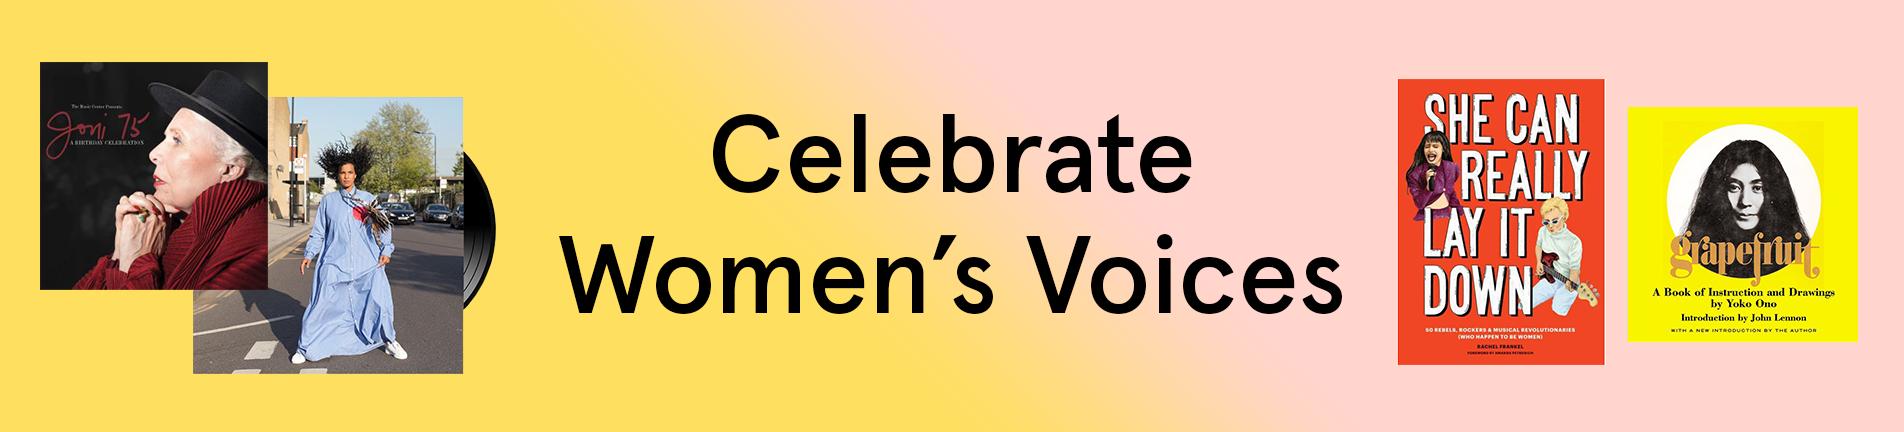 Celebrate Women's Voices